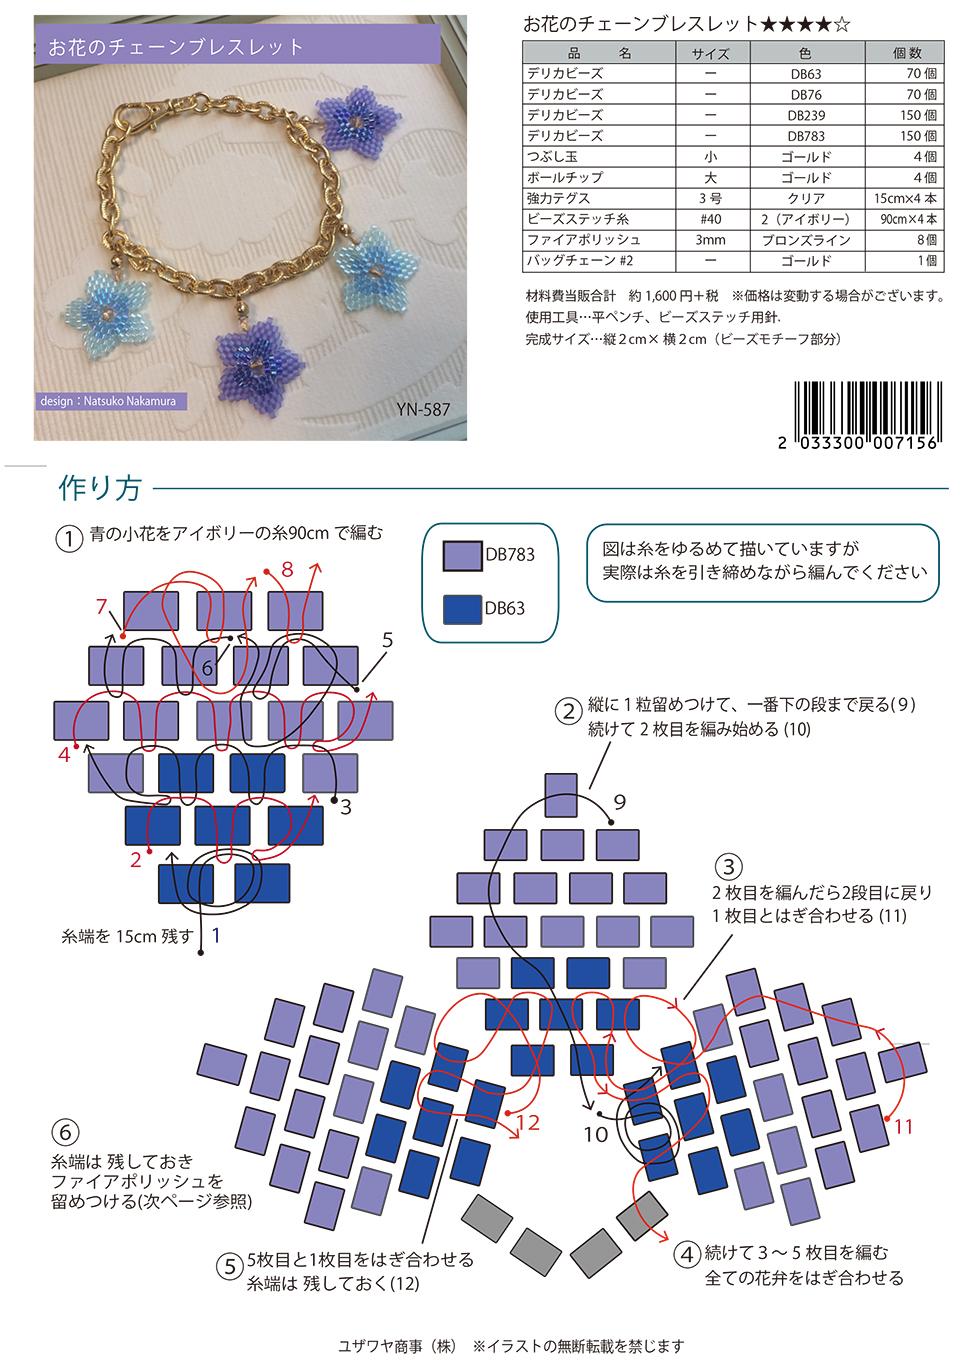 YN-587お花のチェーンブレスレット_1.jpg